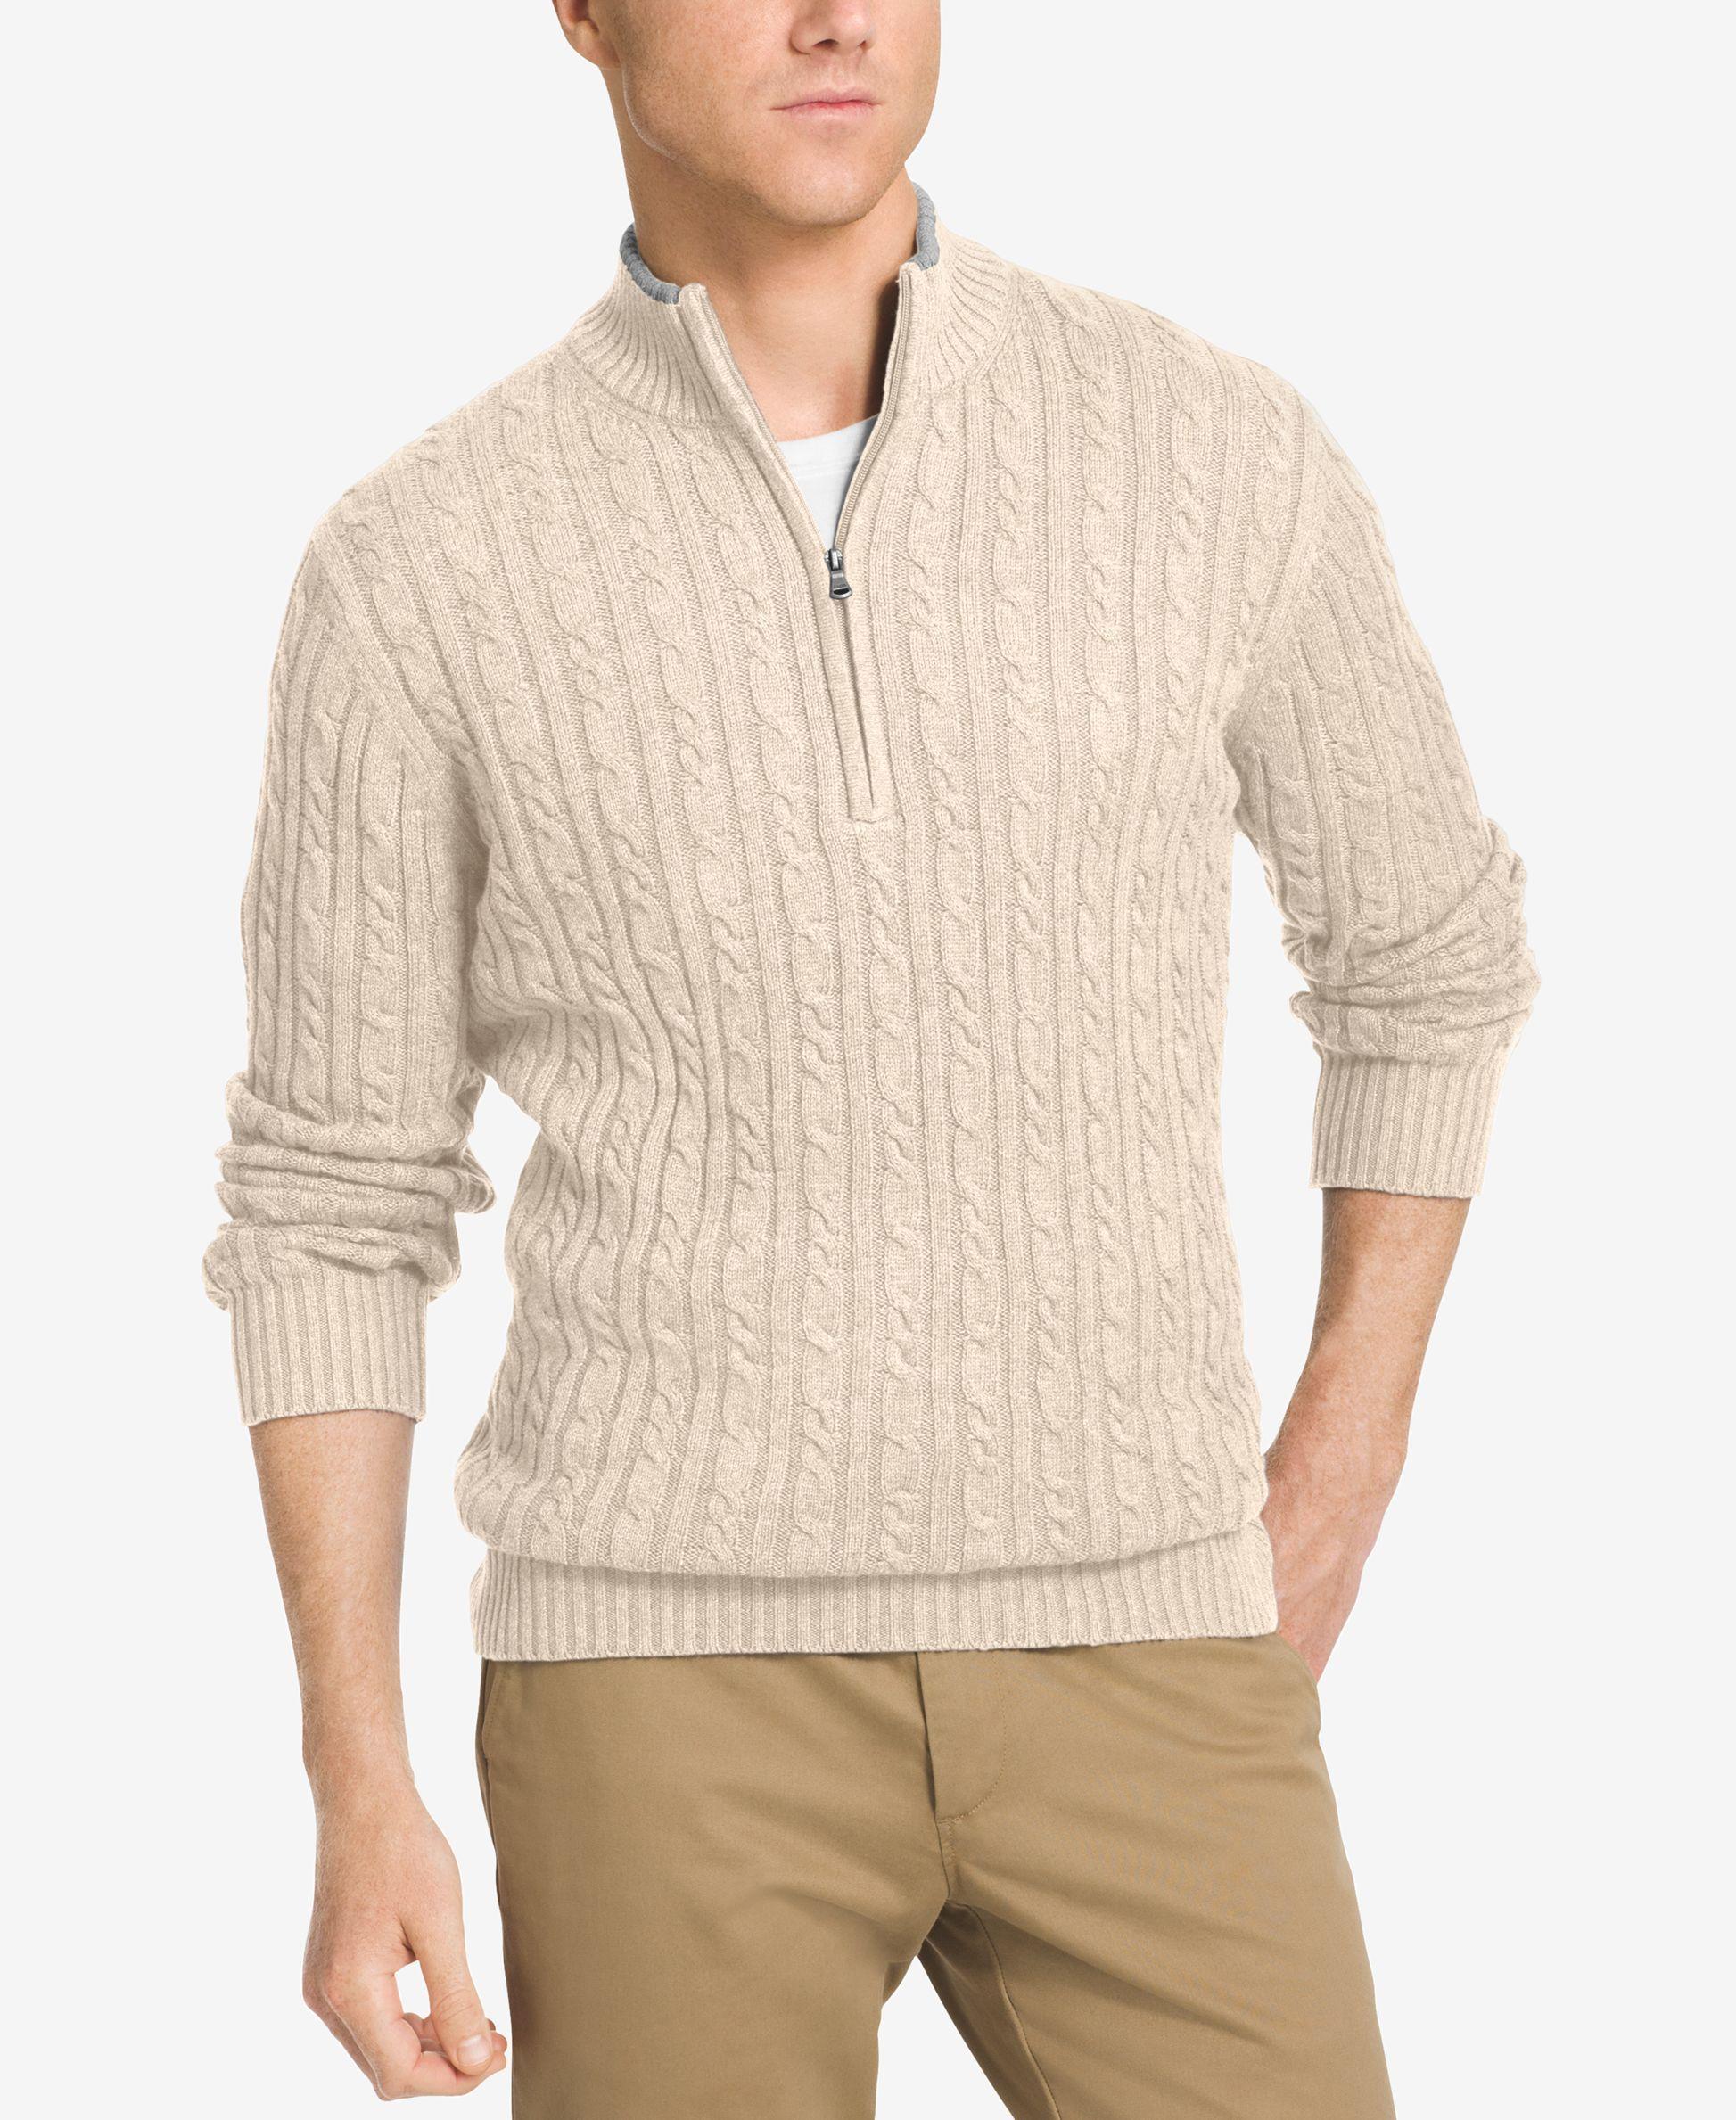 Izod Men's Big & Tall Mock Turtleneck Sweater | Products ...